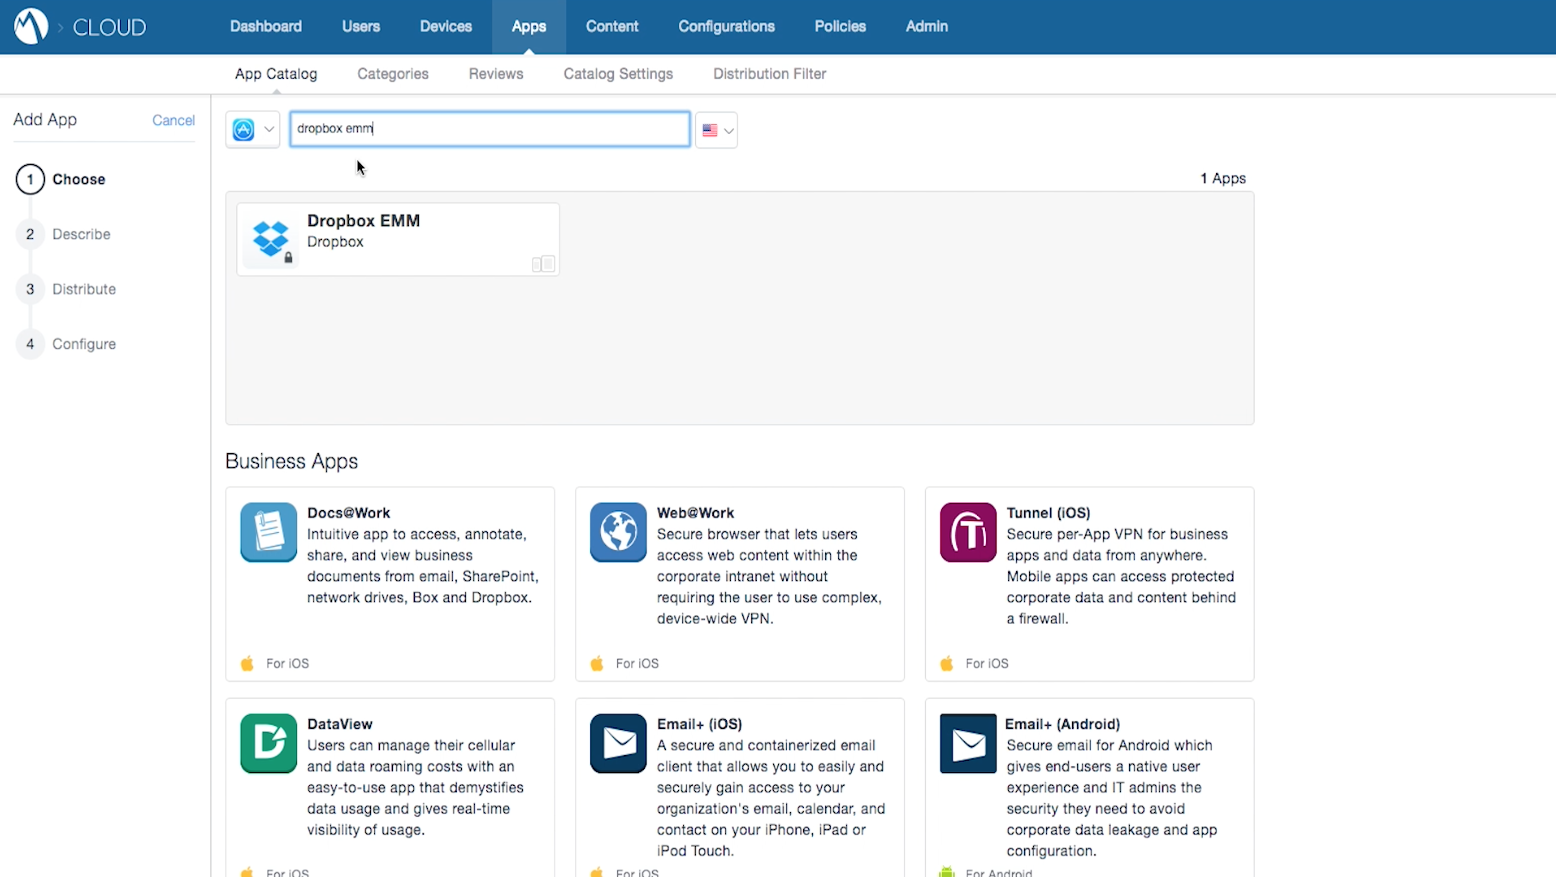 MobileIron の Dropbox EMM 選択画面